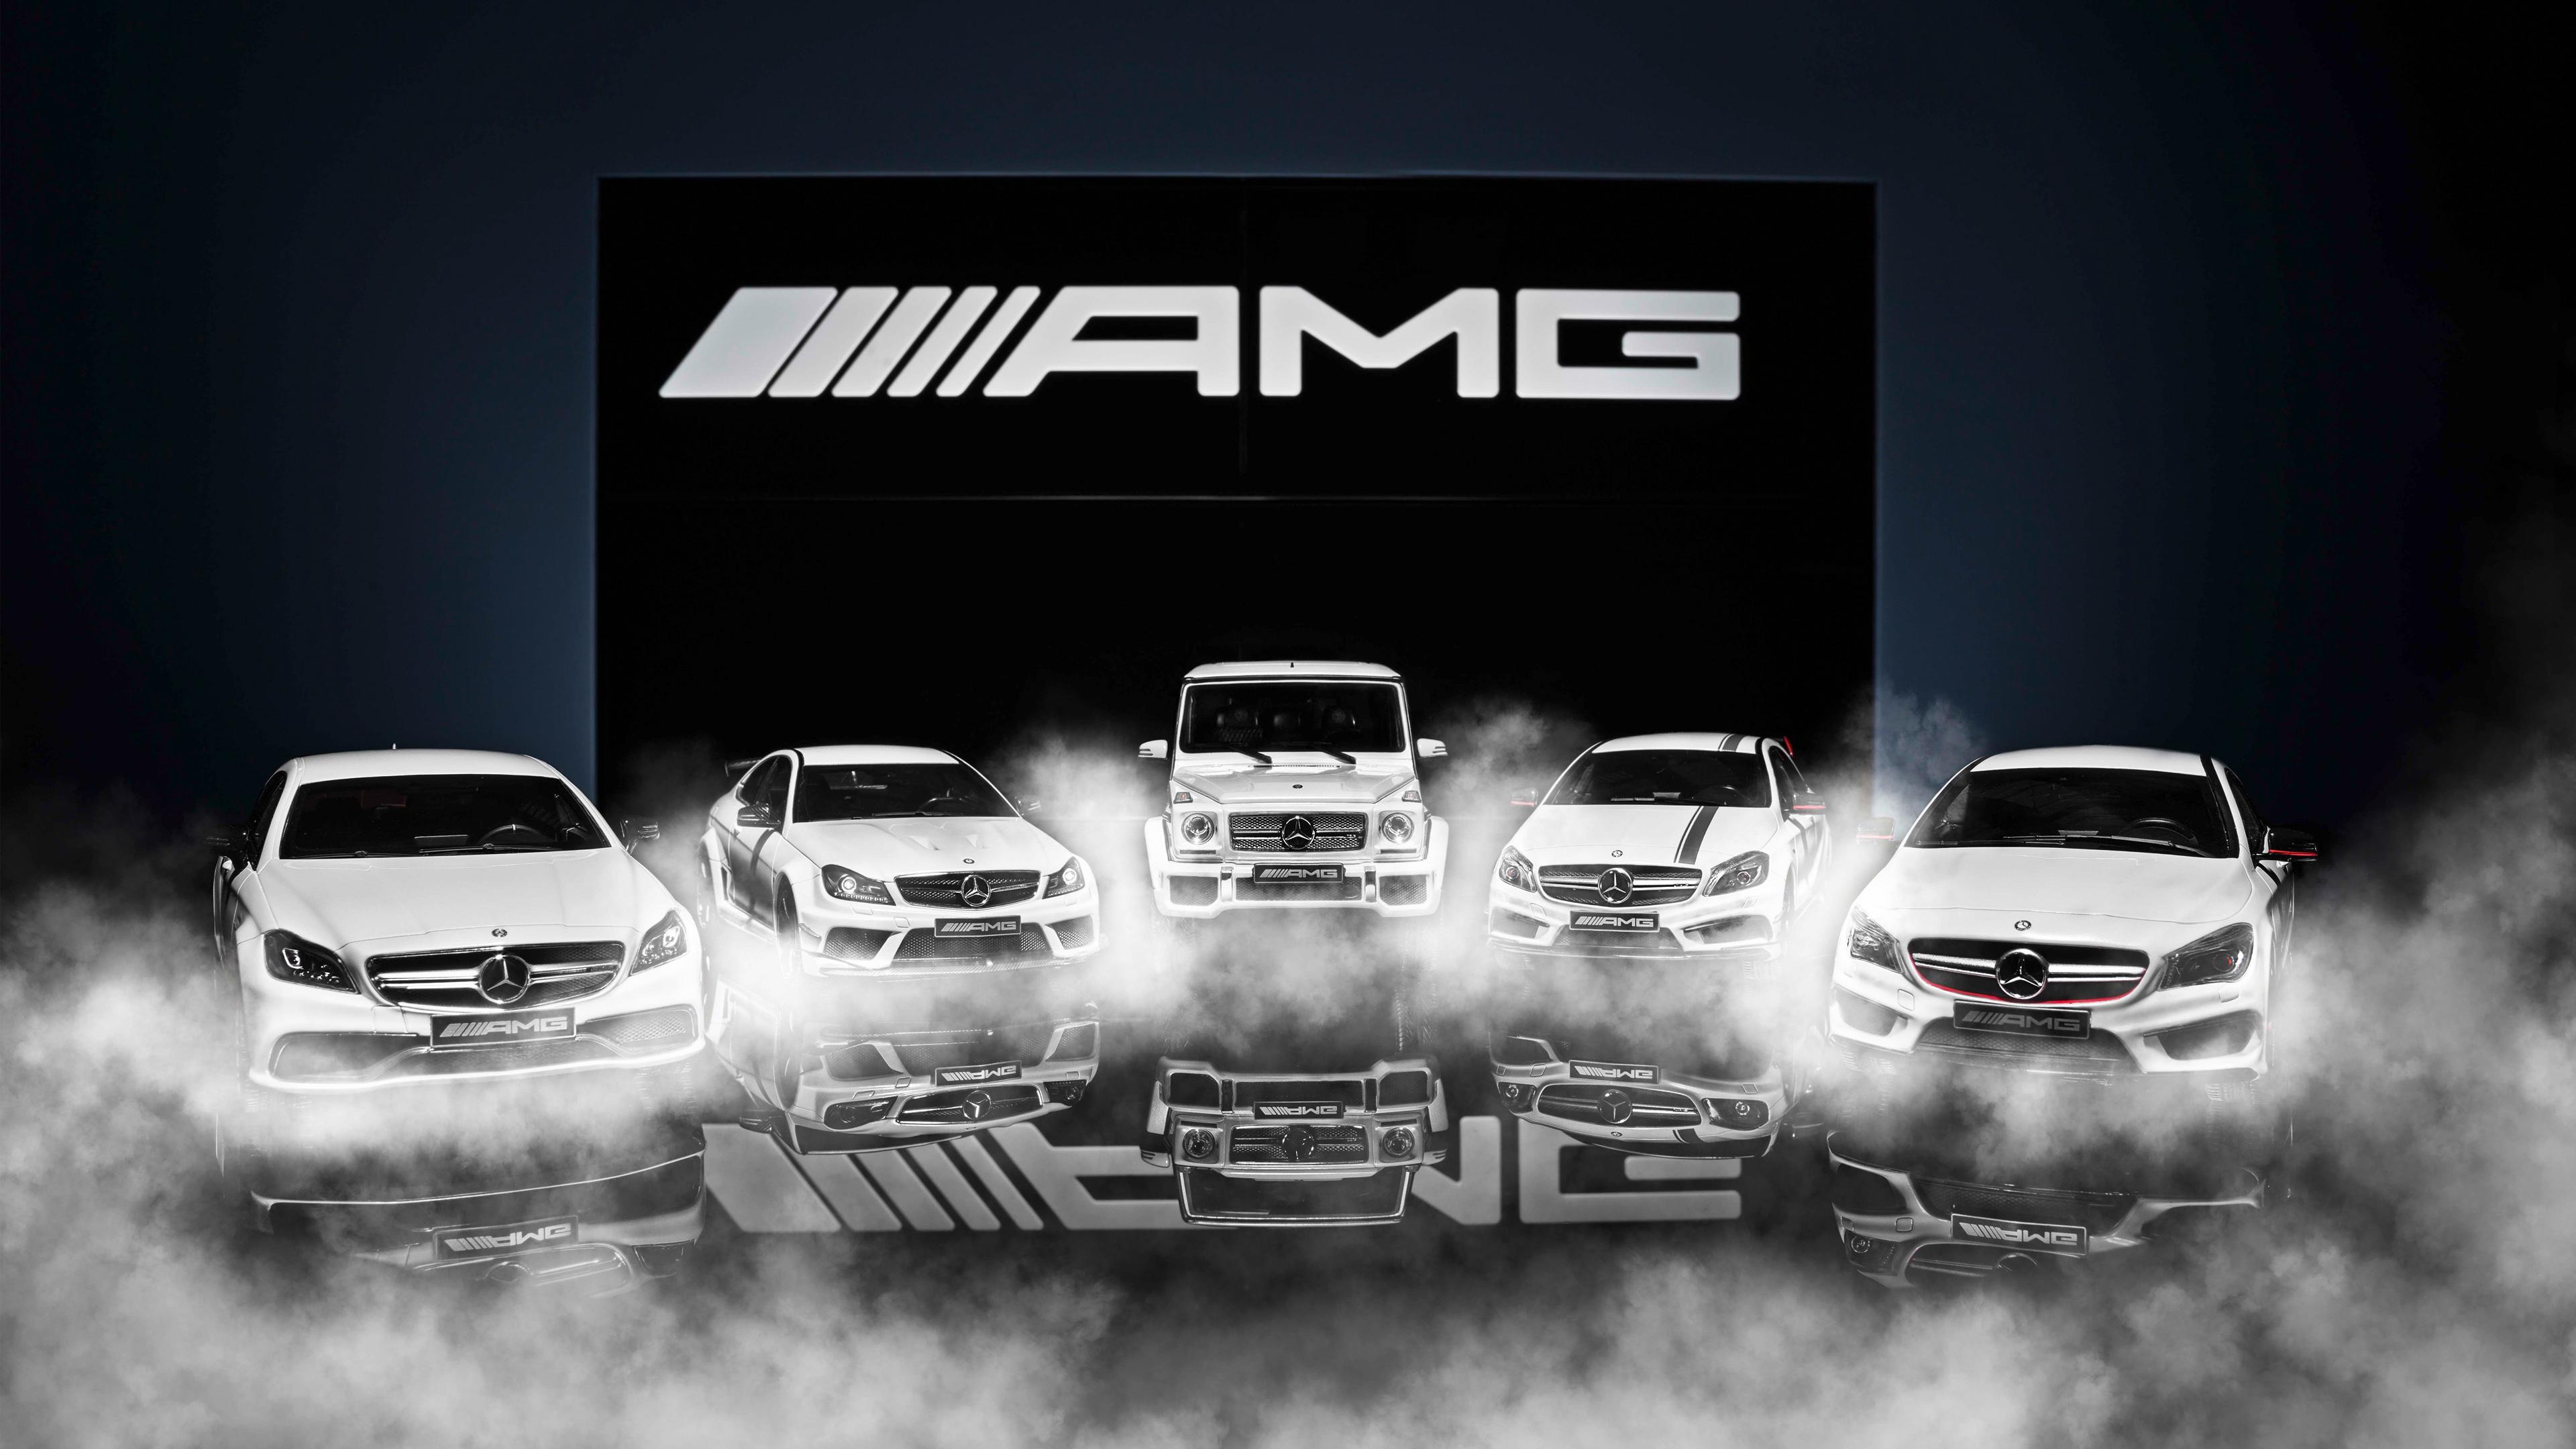 Mercedes benz 4k ultra hd wallpaper and background image 3840x2160 vehicles mercedes benz wallpaper voltagebd Gallery